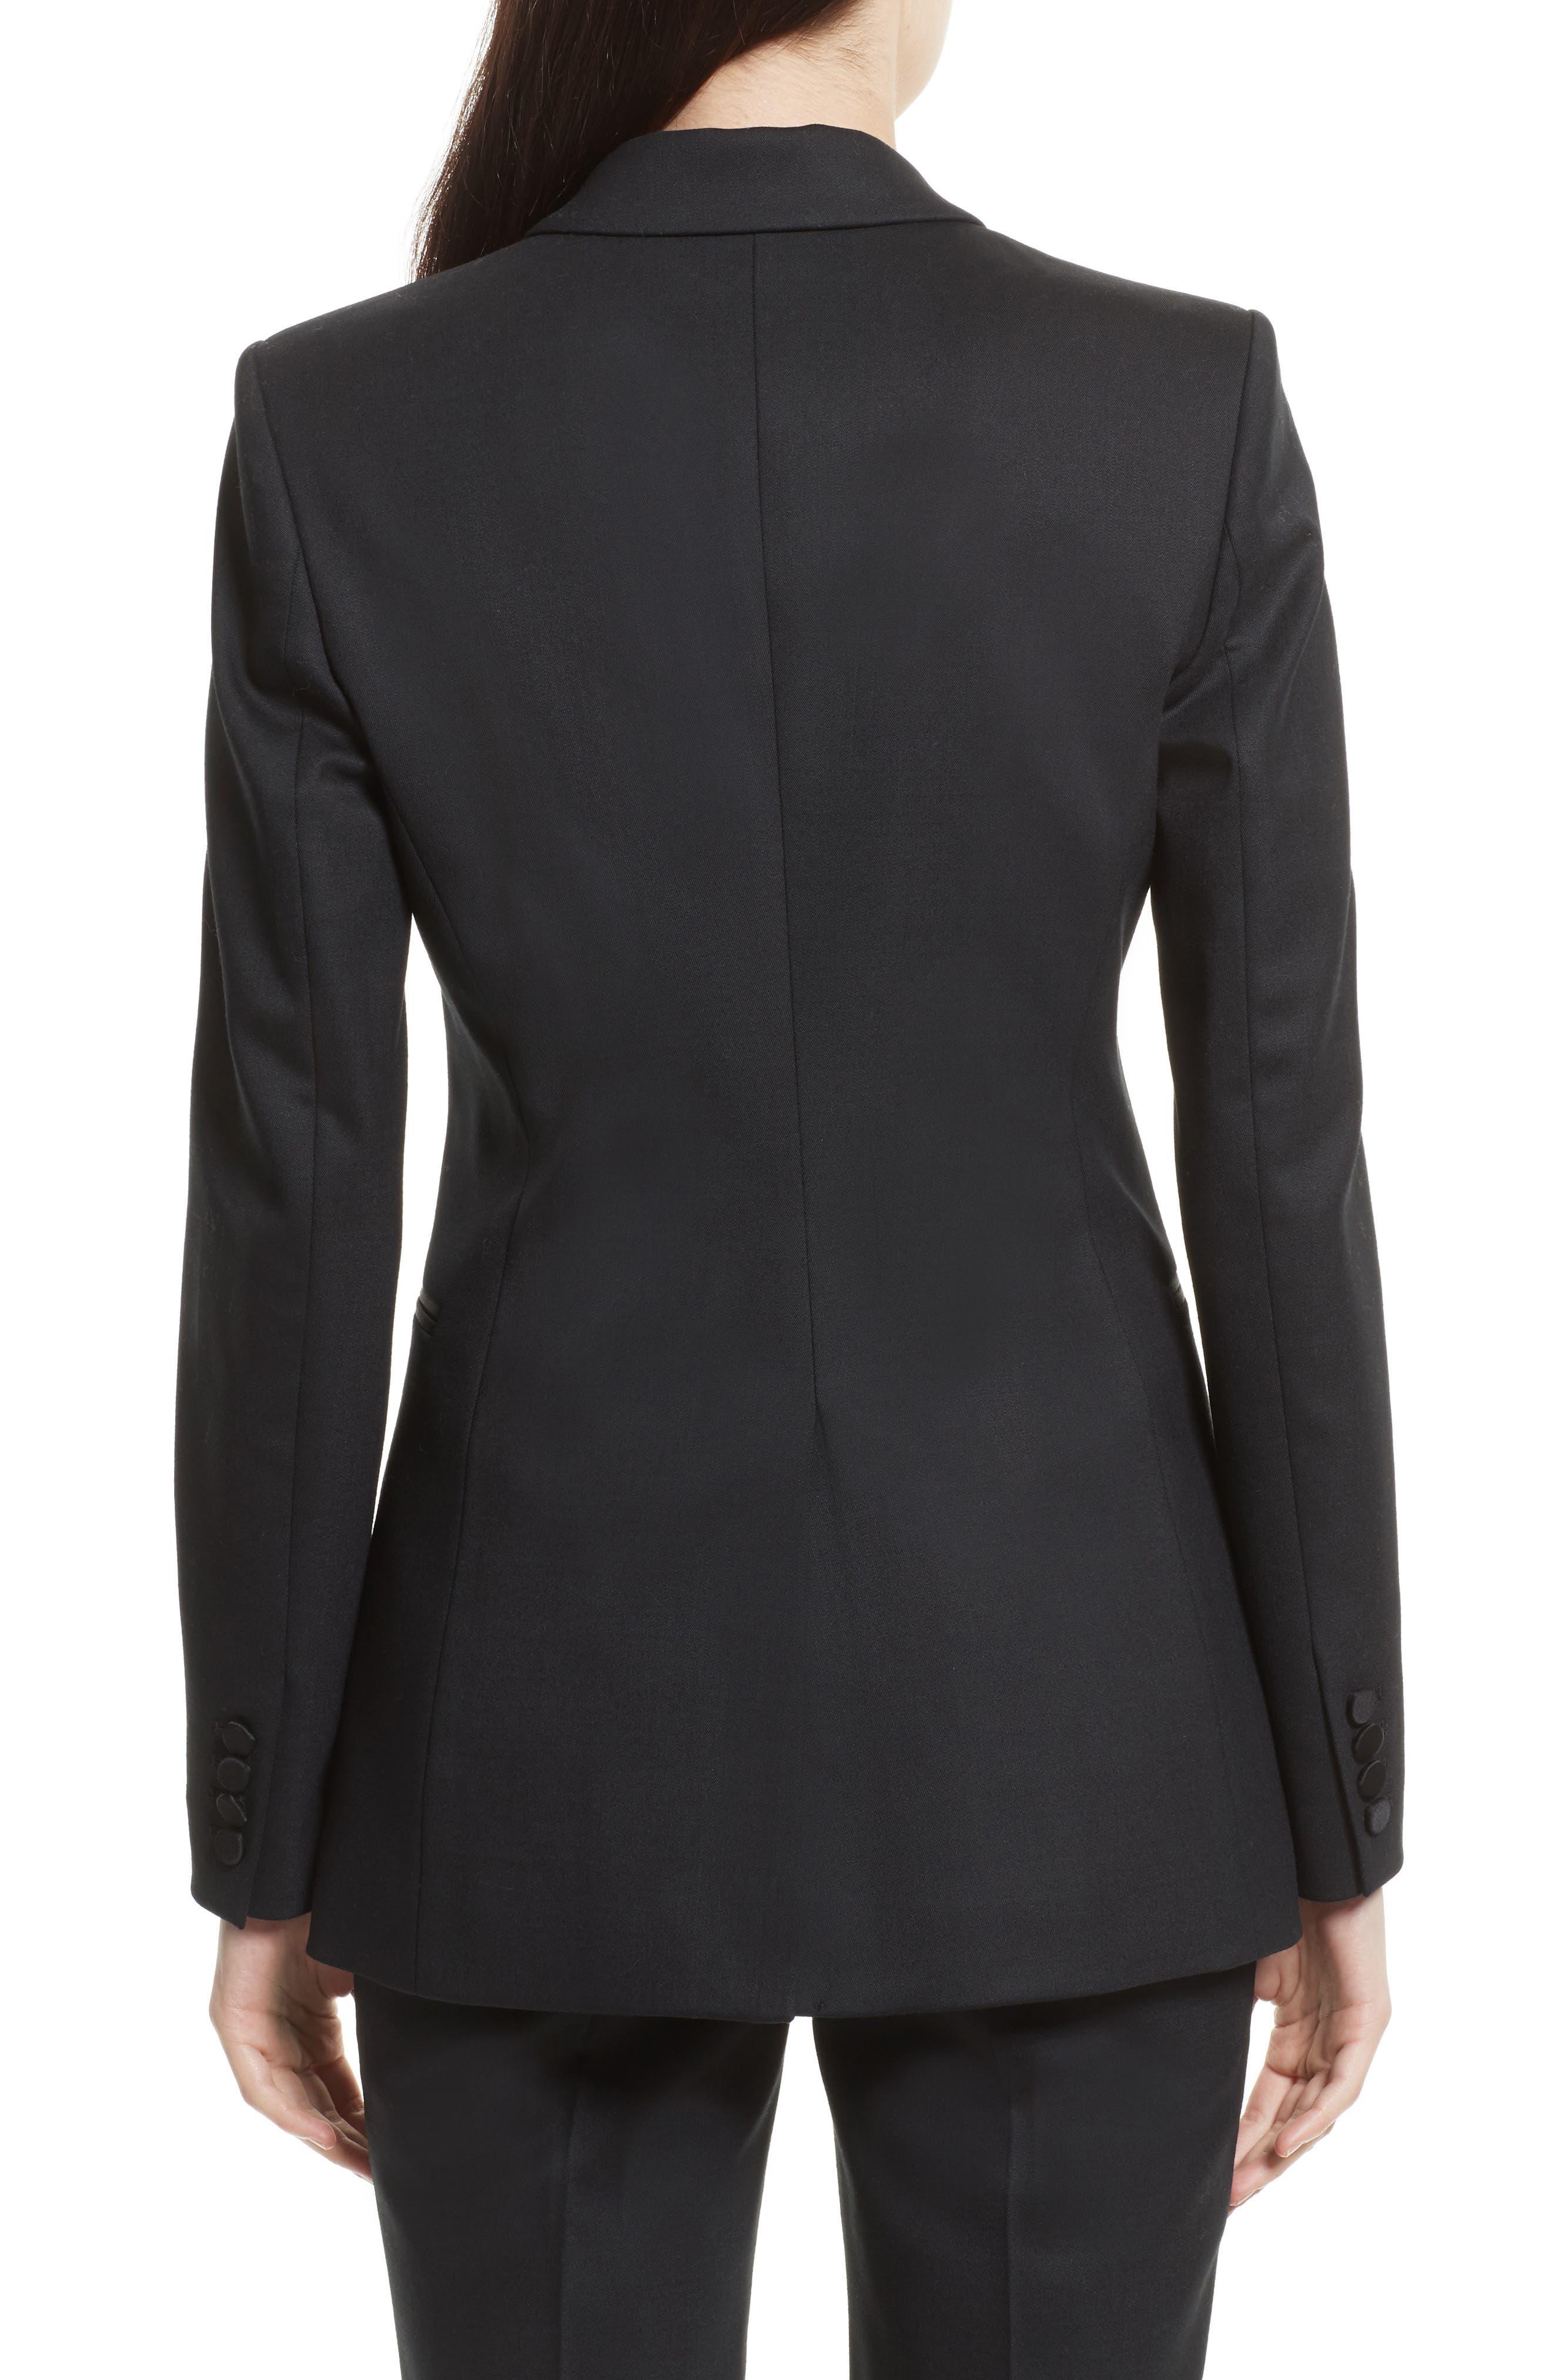 Wool Blend Tuxedo Jacket,                             Alternate thumbnail 2, color,                             001